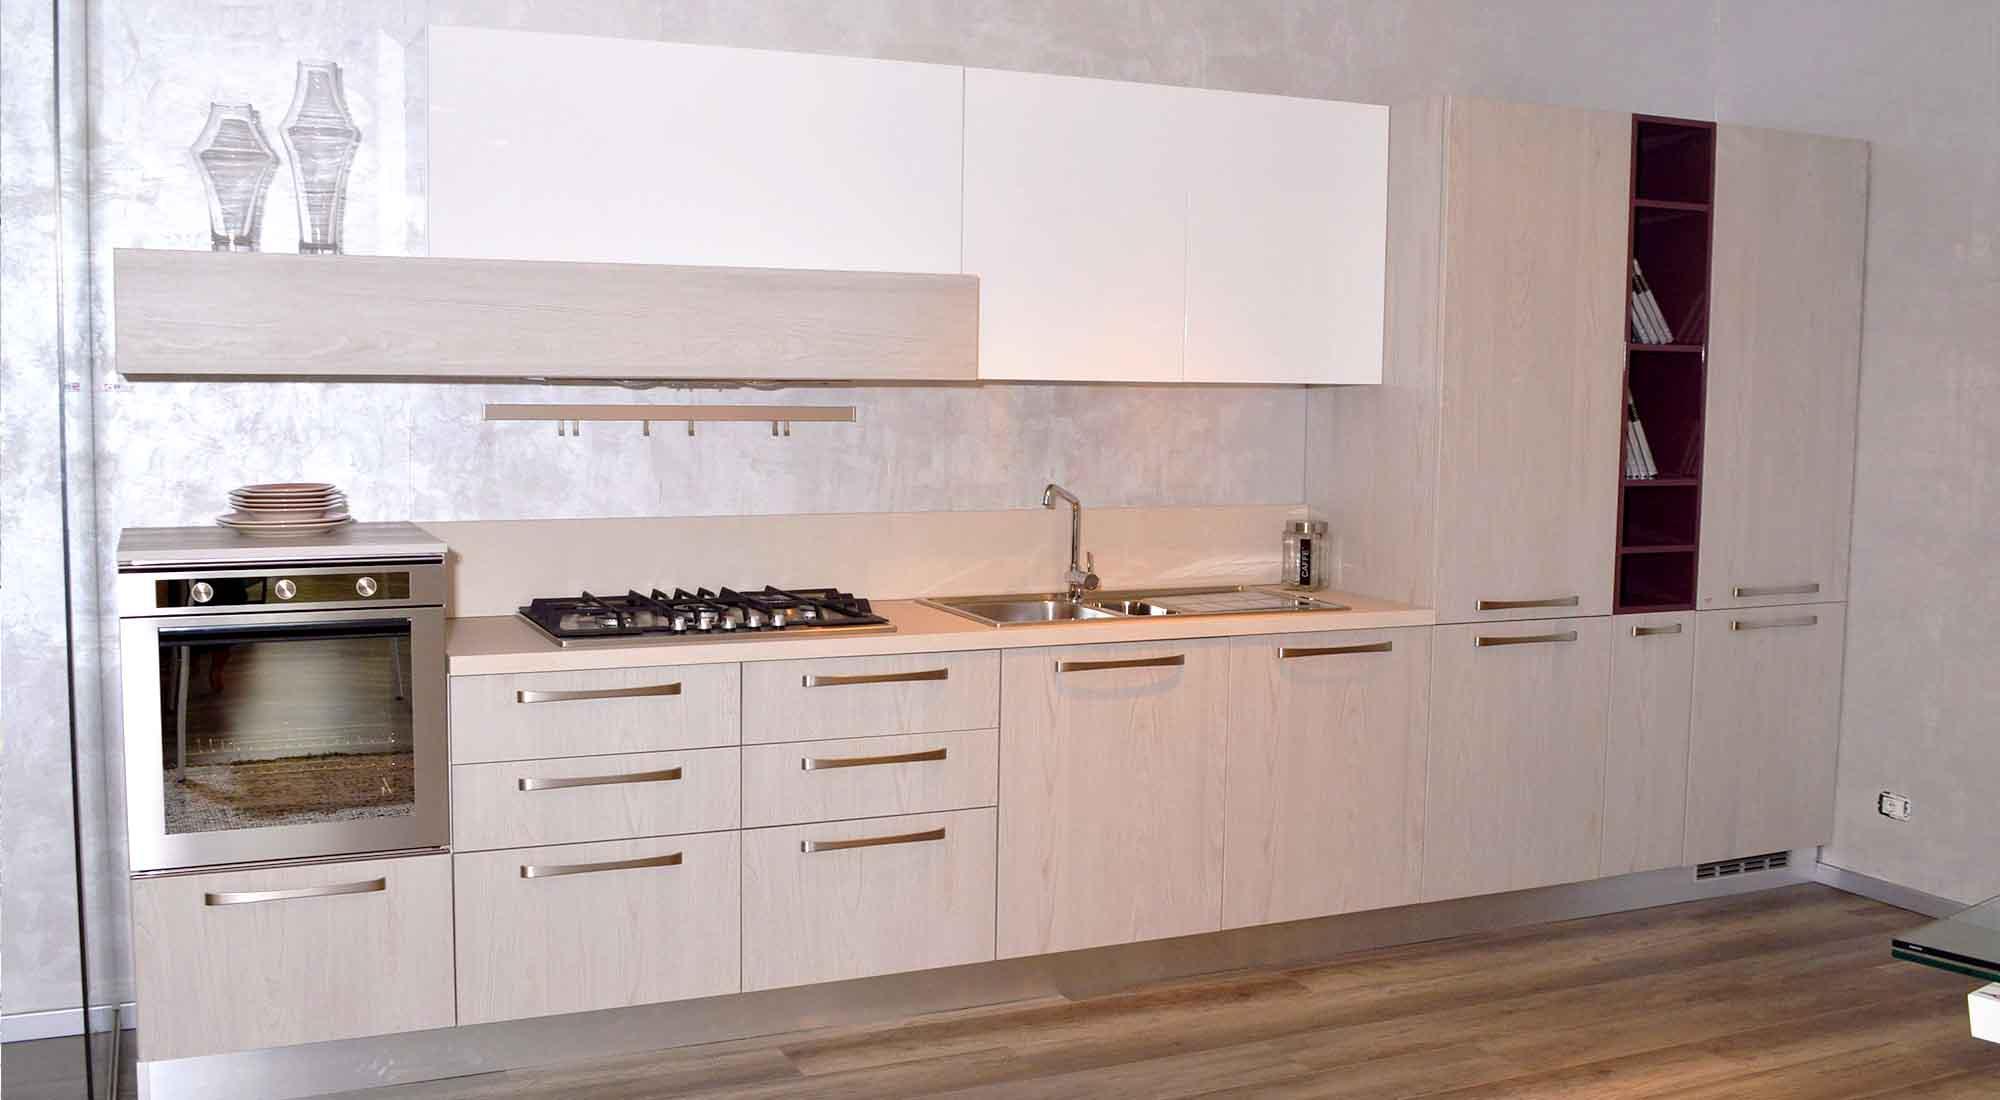 Basi e pensili per cucine componibili latest base ad - Misure basi cucina ...